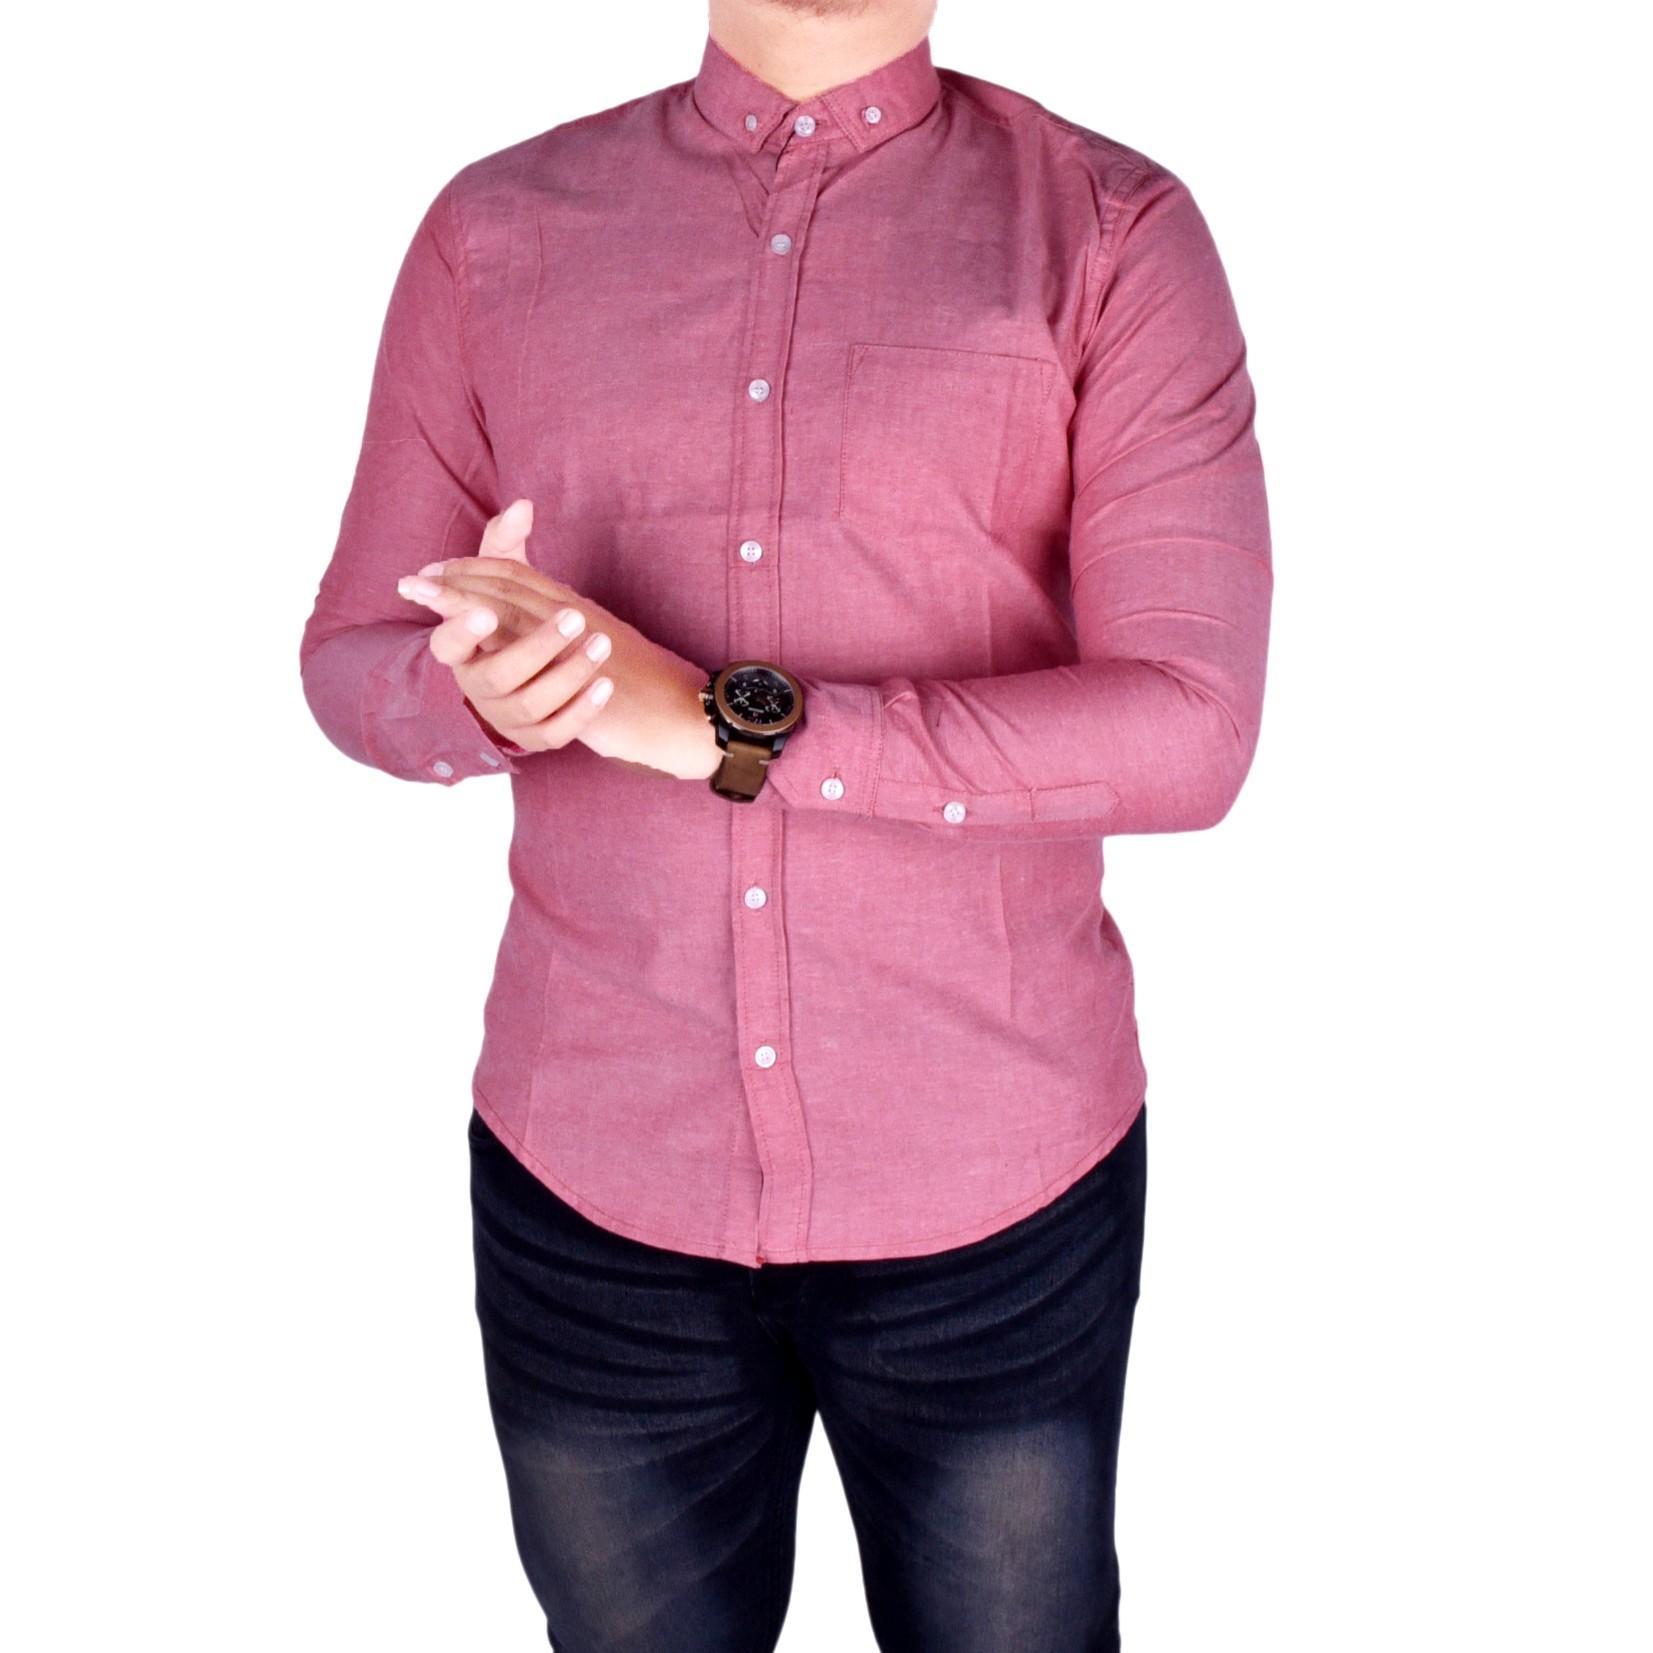 Review Dgm Fashion1 Kemeja Lengan Panjang Flanel Beckham Batik Pria 2 Layer Mlxl Polos Pink Casual